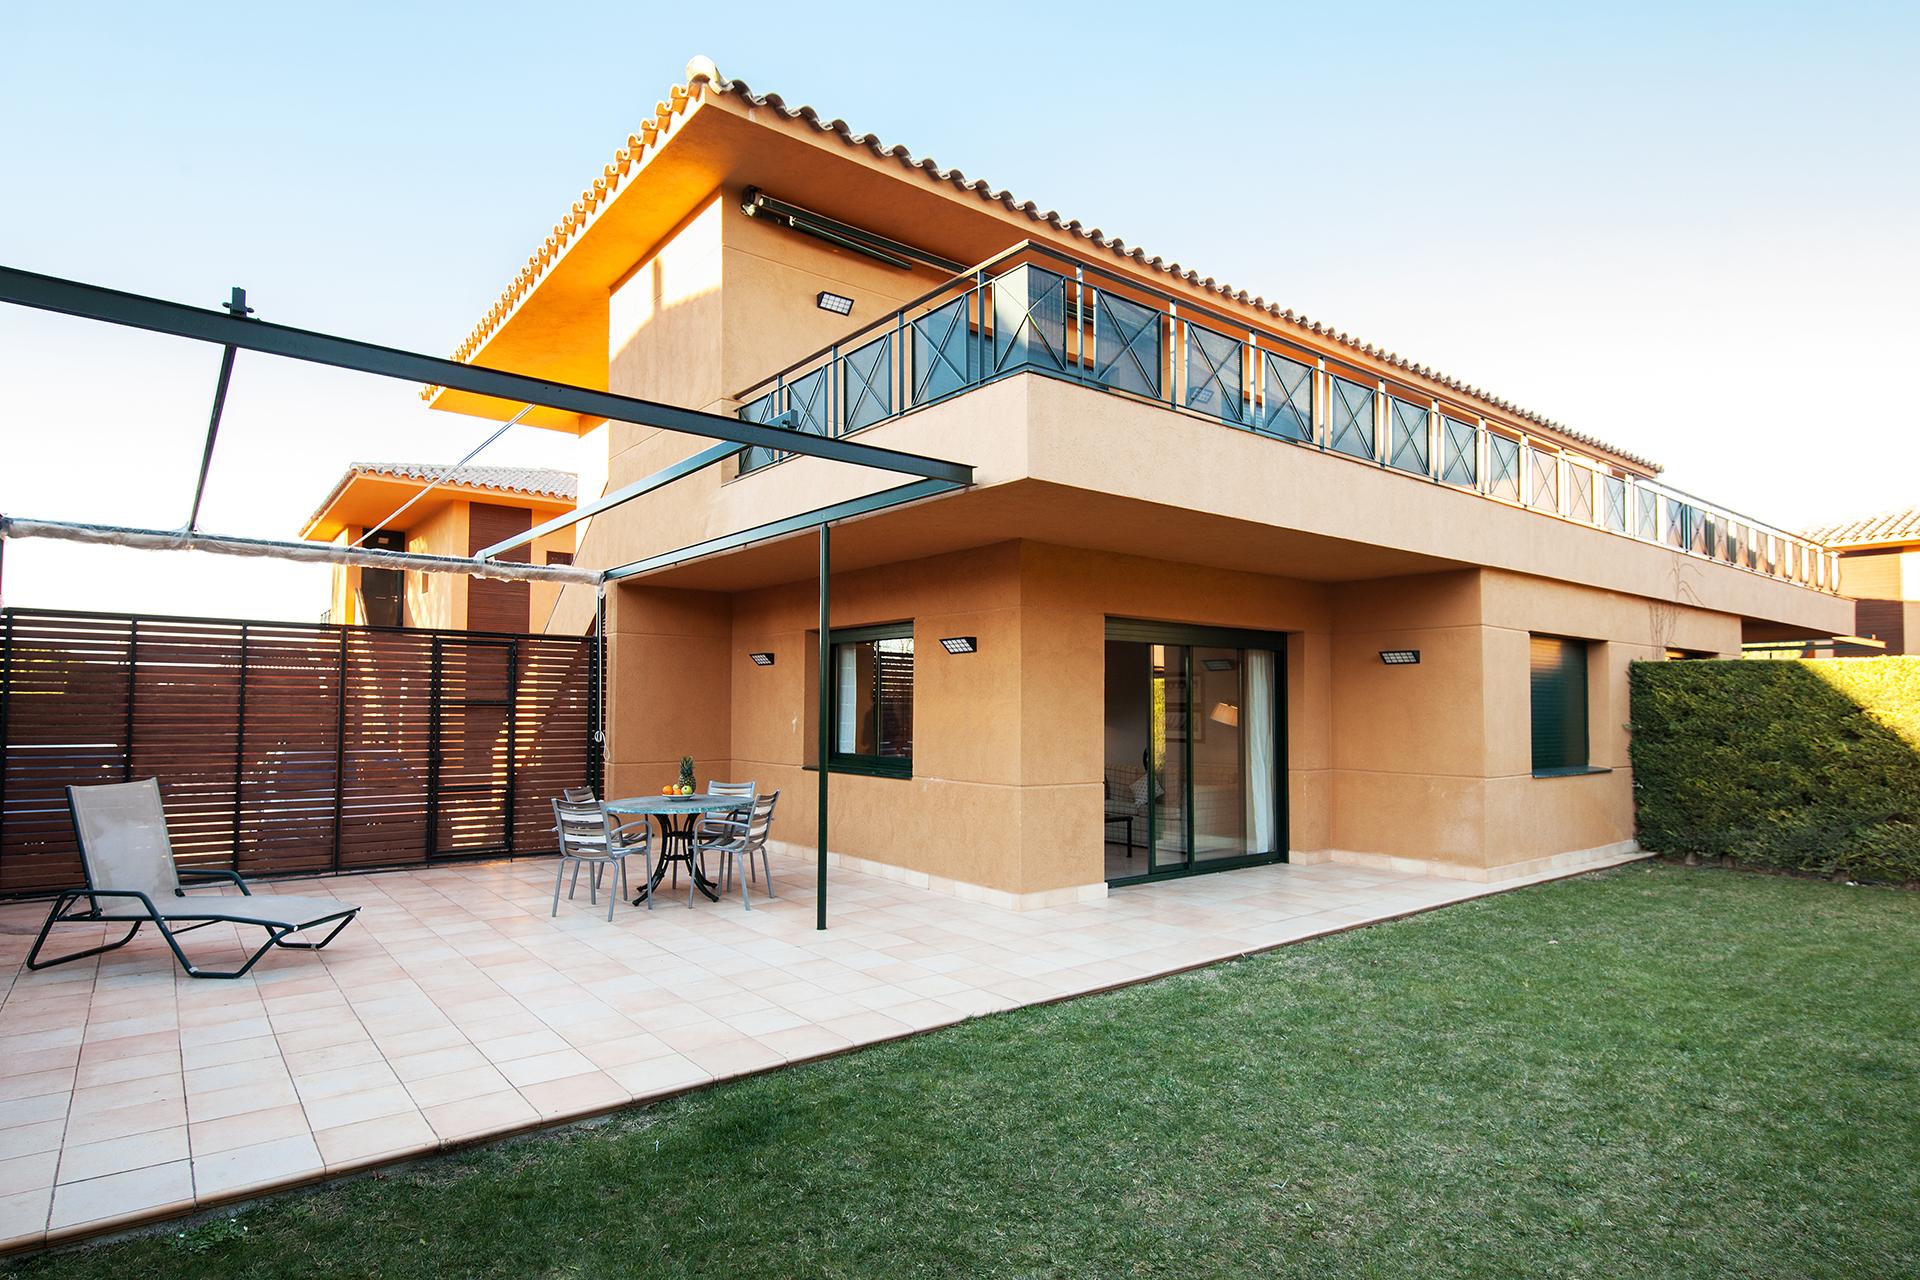 Golf-Expedition-Golf-reizen-Spanje-Regio-Barcelona-TorreMirona-Golf-&-Spa-Resort-Garden-Suite